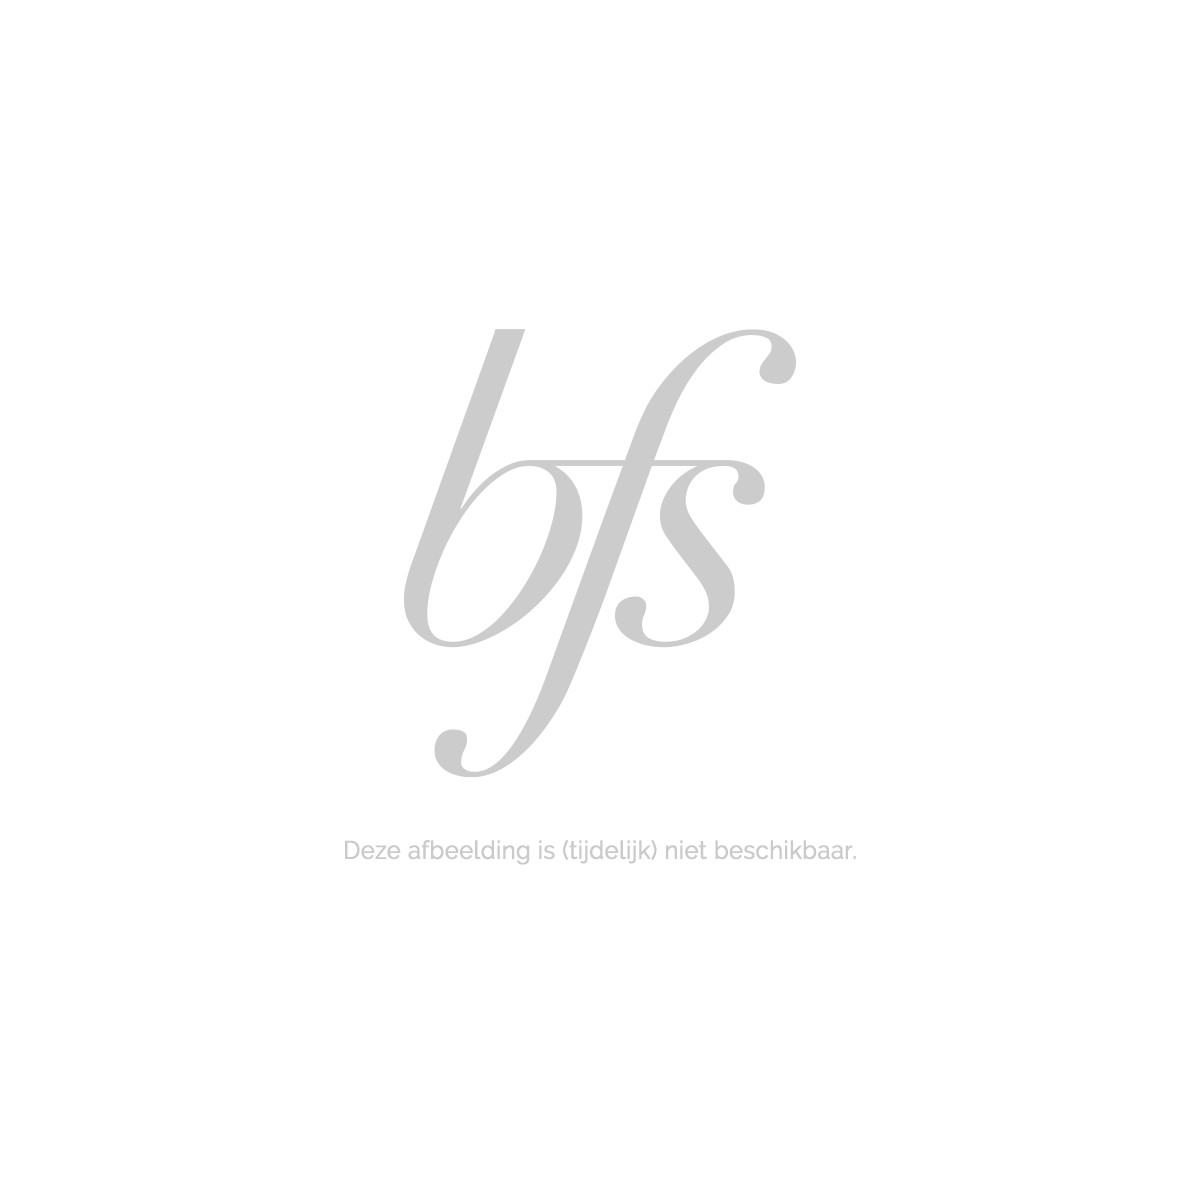 Tria Beauty Hair Removal Laser 4X - Fuchsia